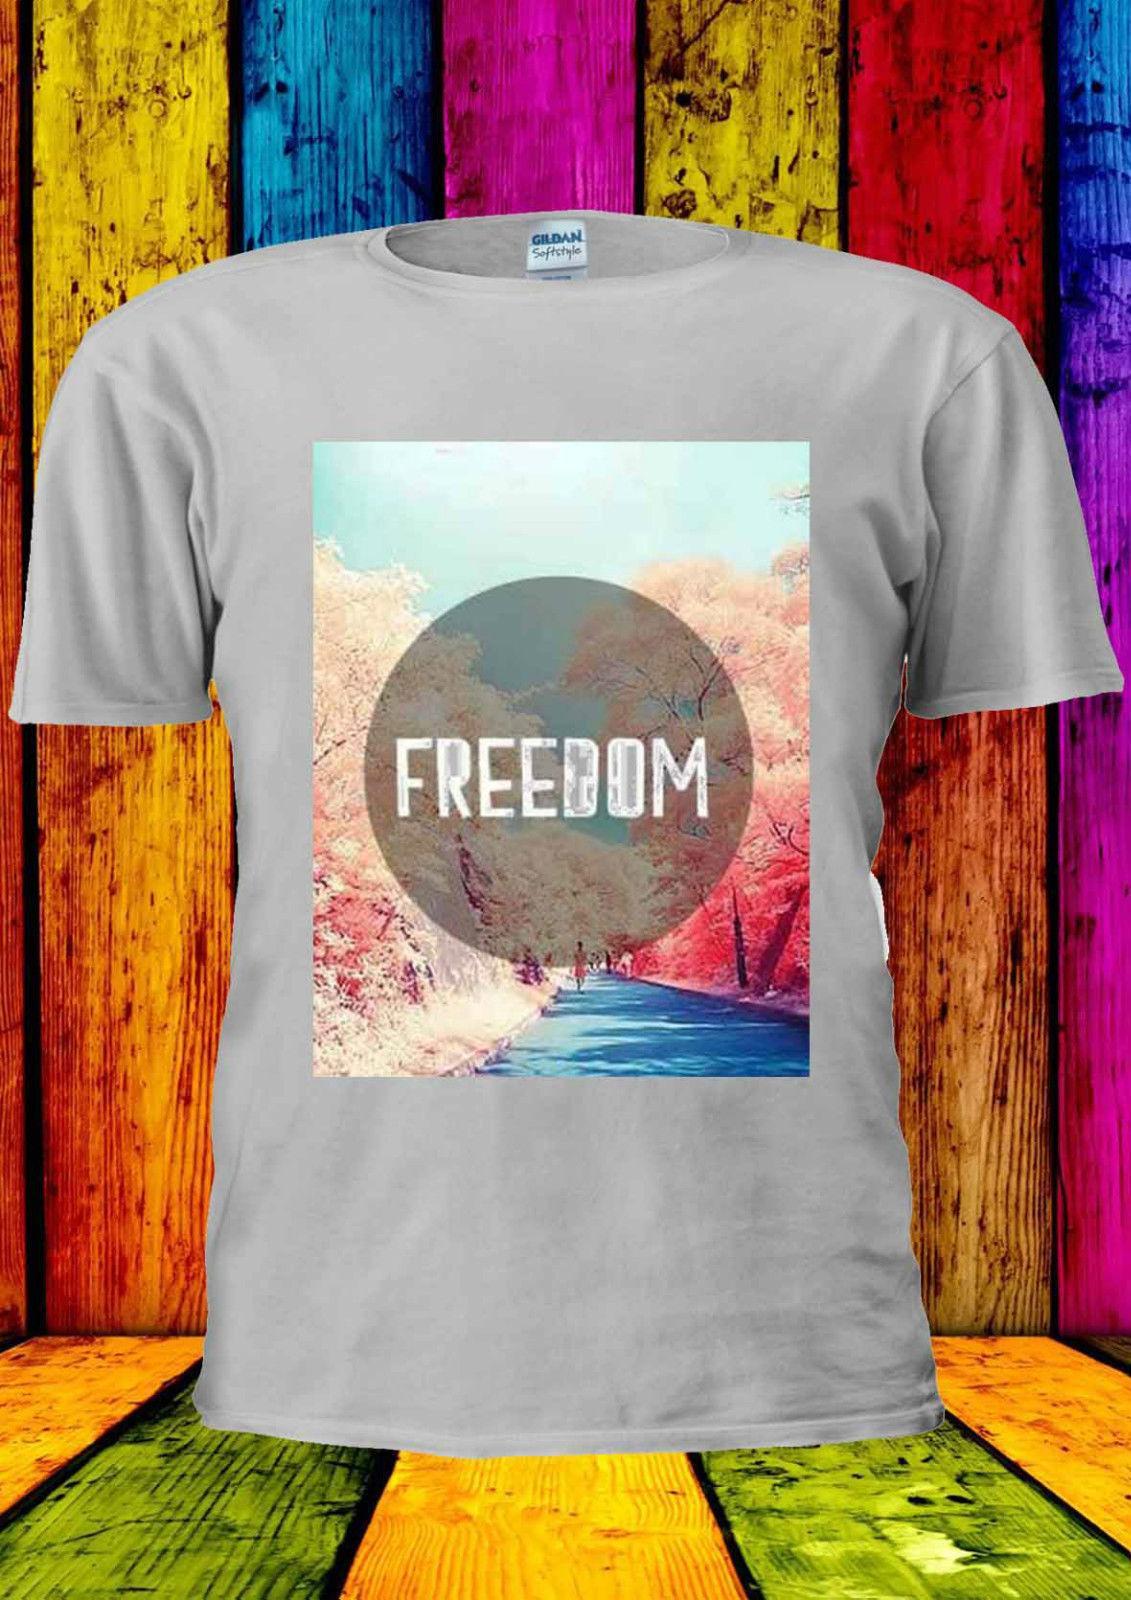 Compre Camiseta Hombres Freedom Tumblr Chaleco Instagram Blogger vrWrqwTRI